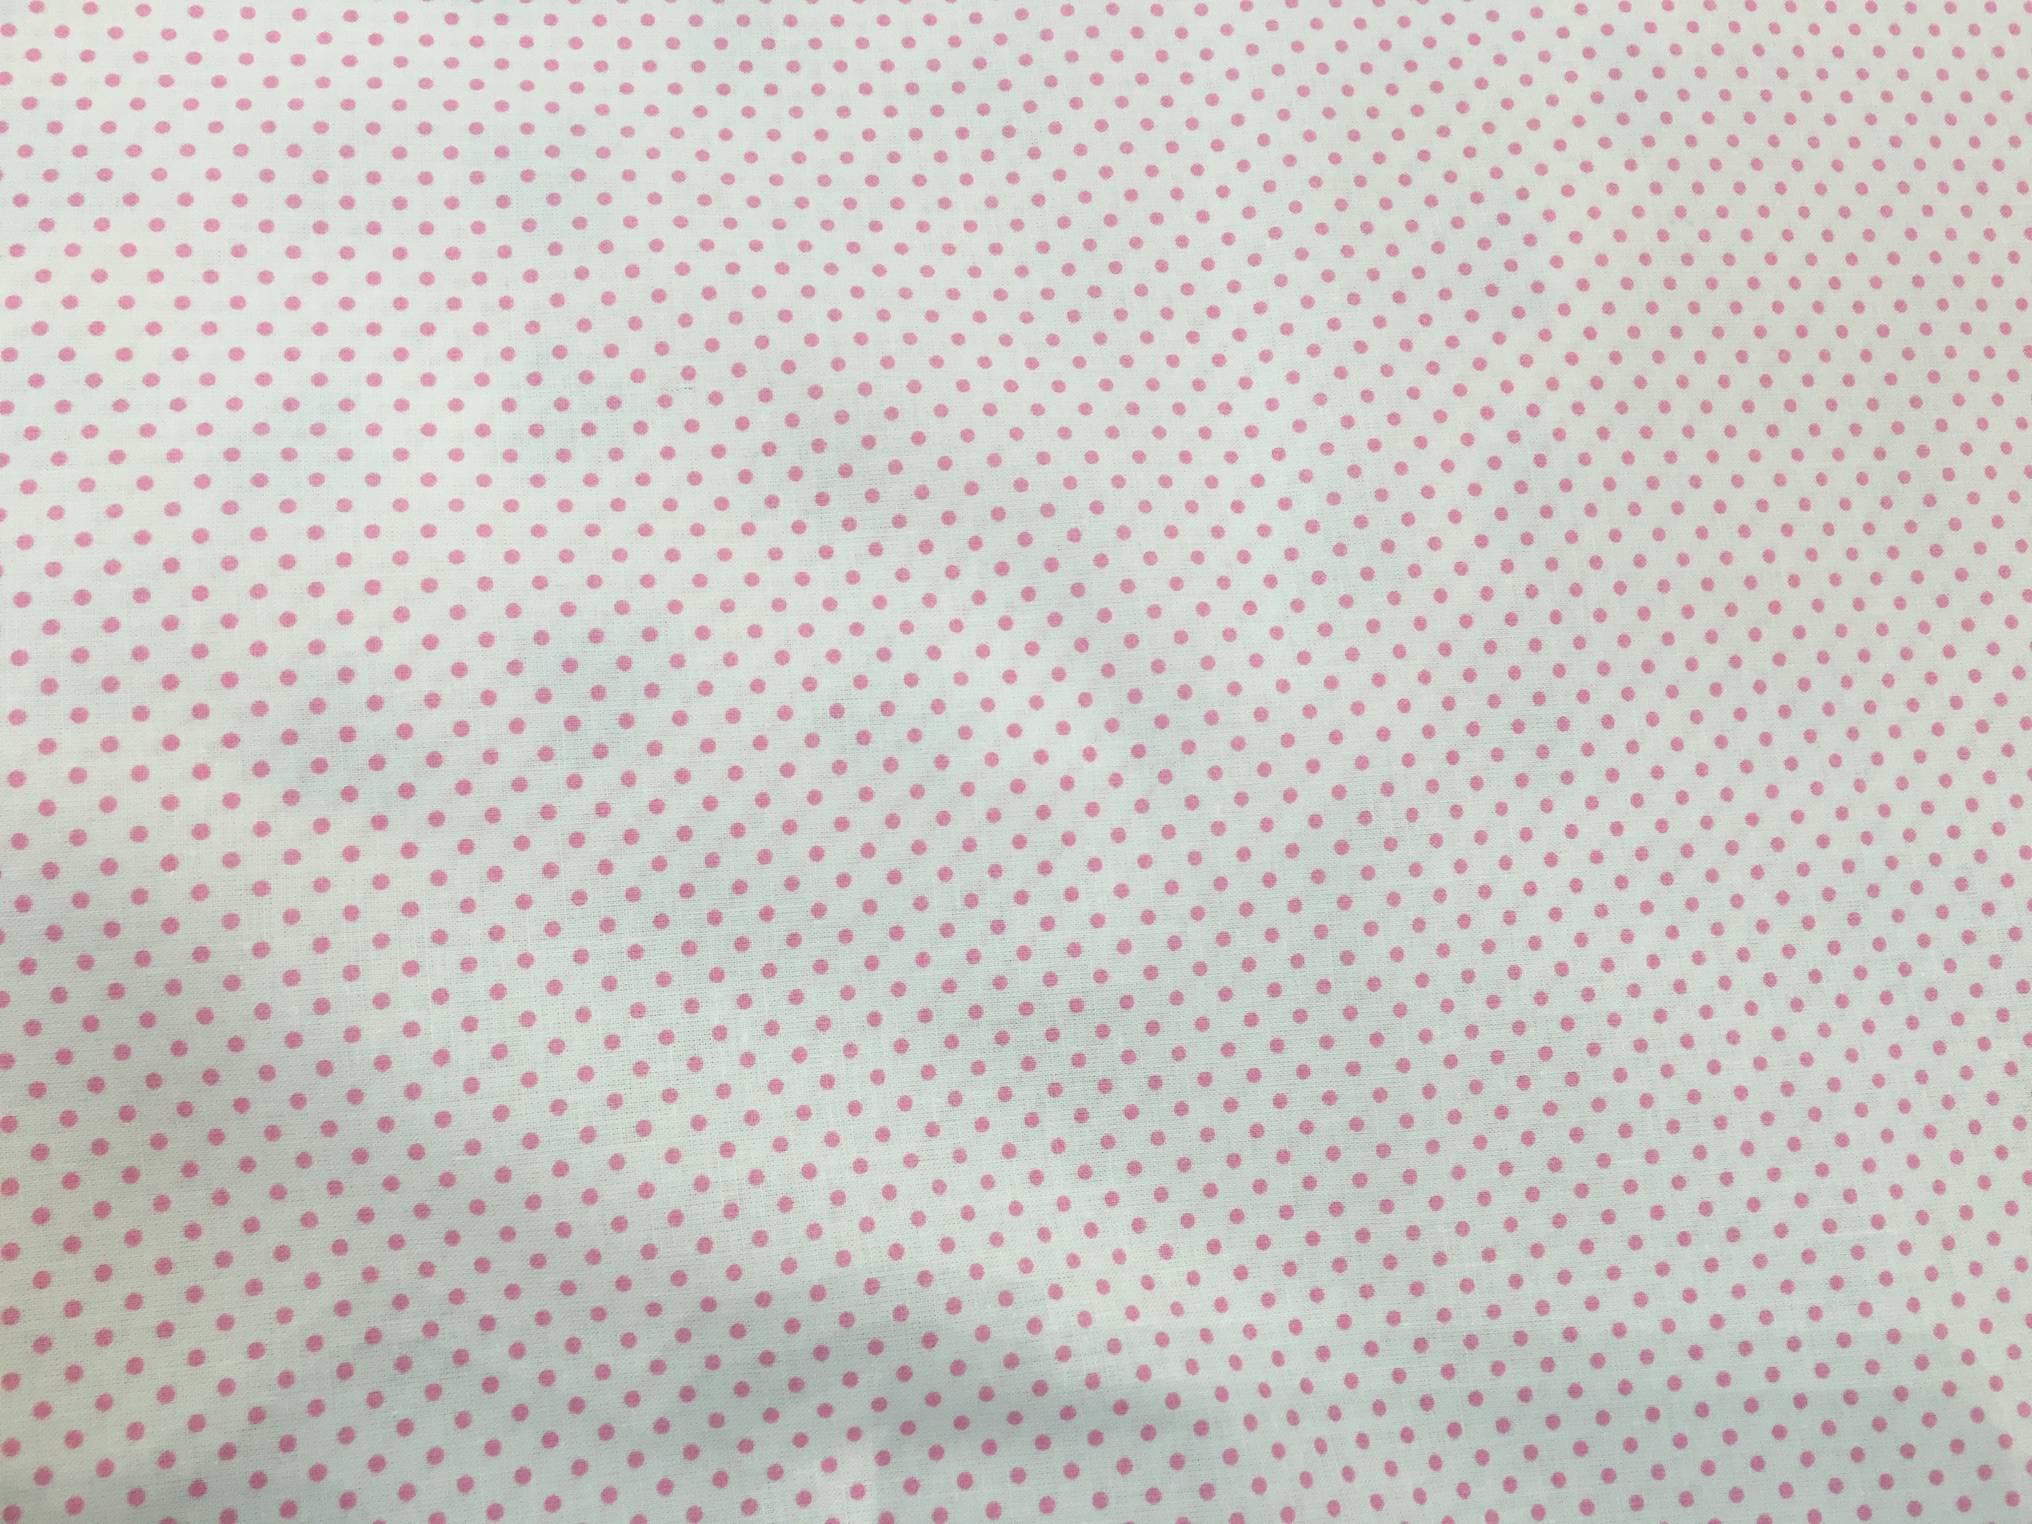 Tessuto Cotone a Pois Rosa